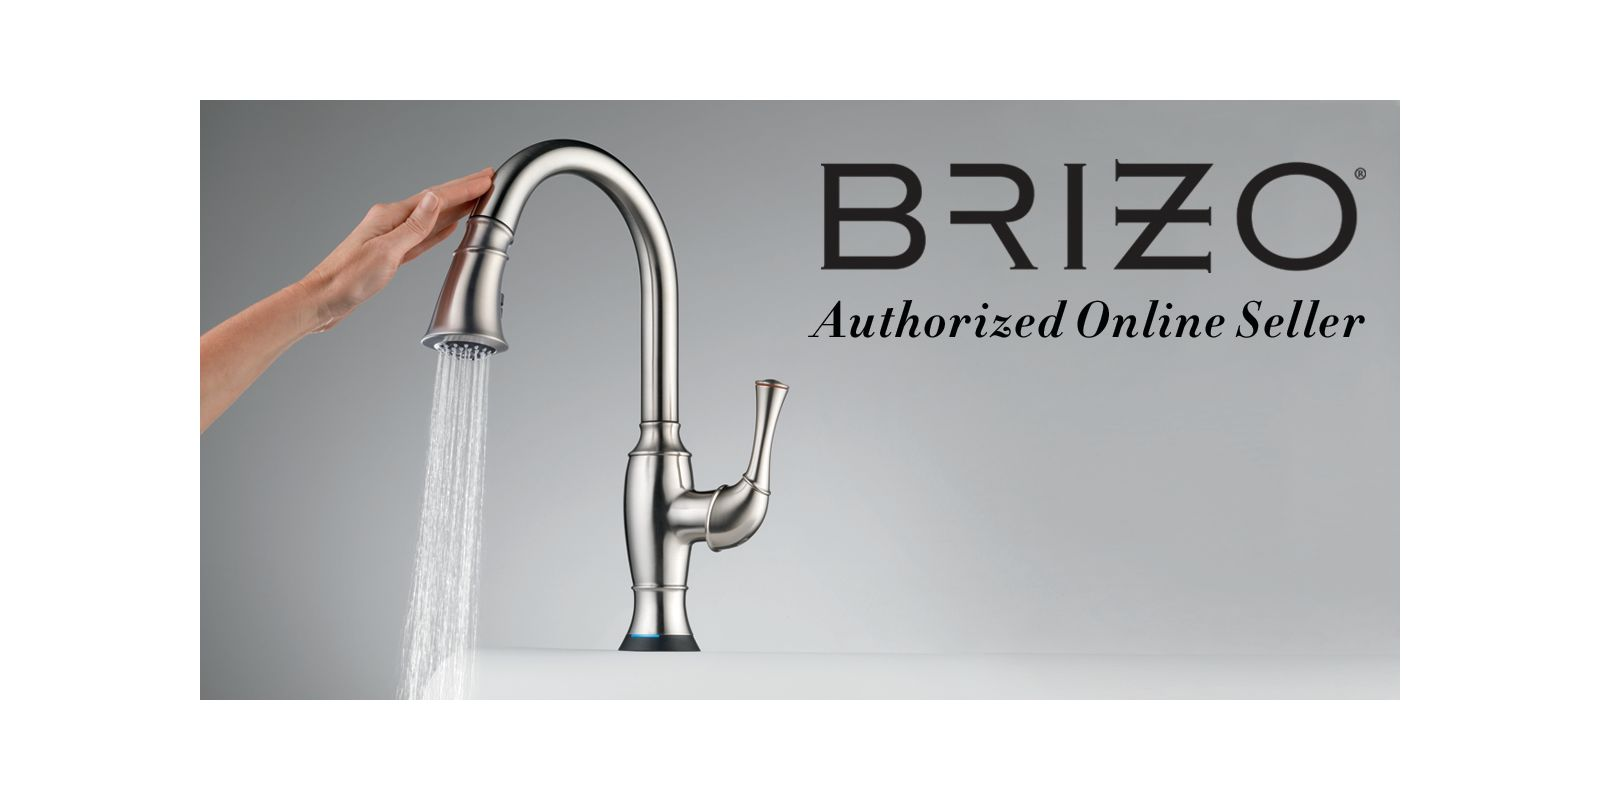 Brizo 63500-PC Polished Chrome Kitchen Faucet Single Handle Pull ...